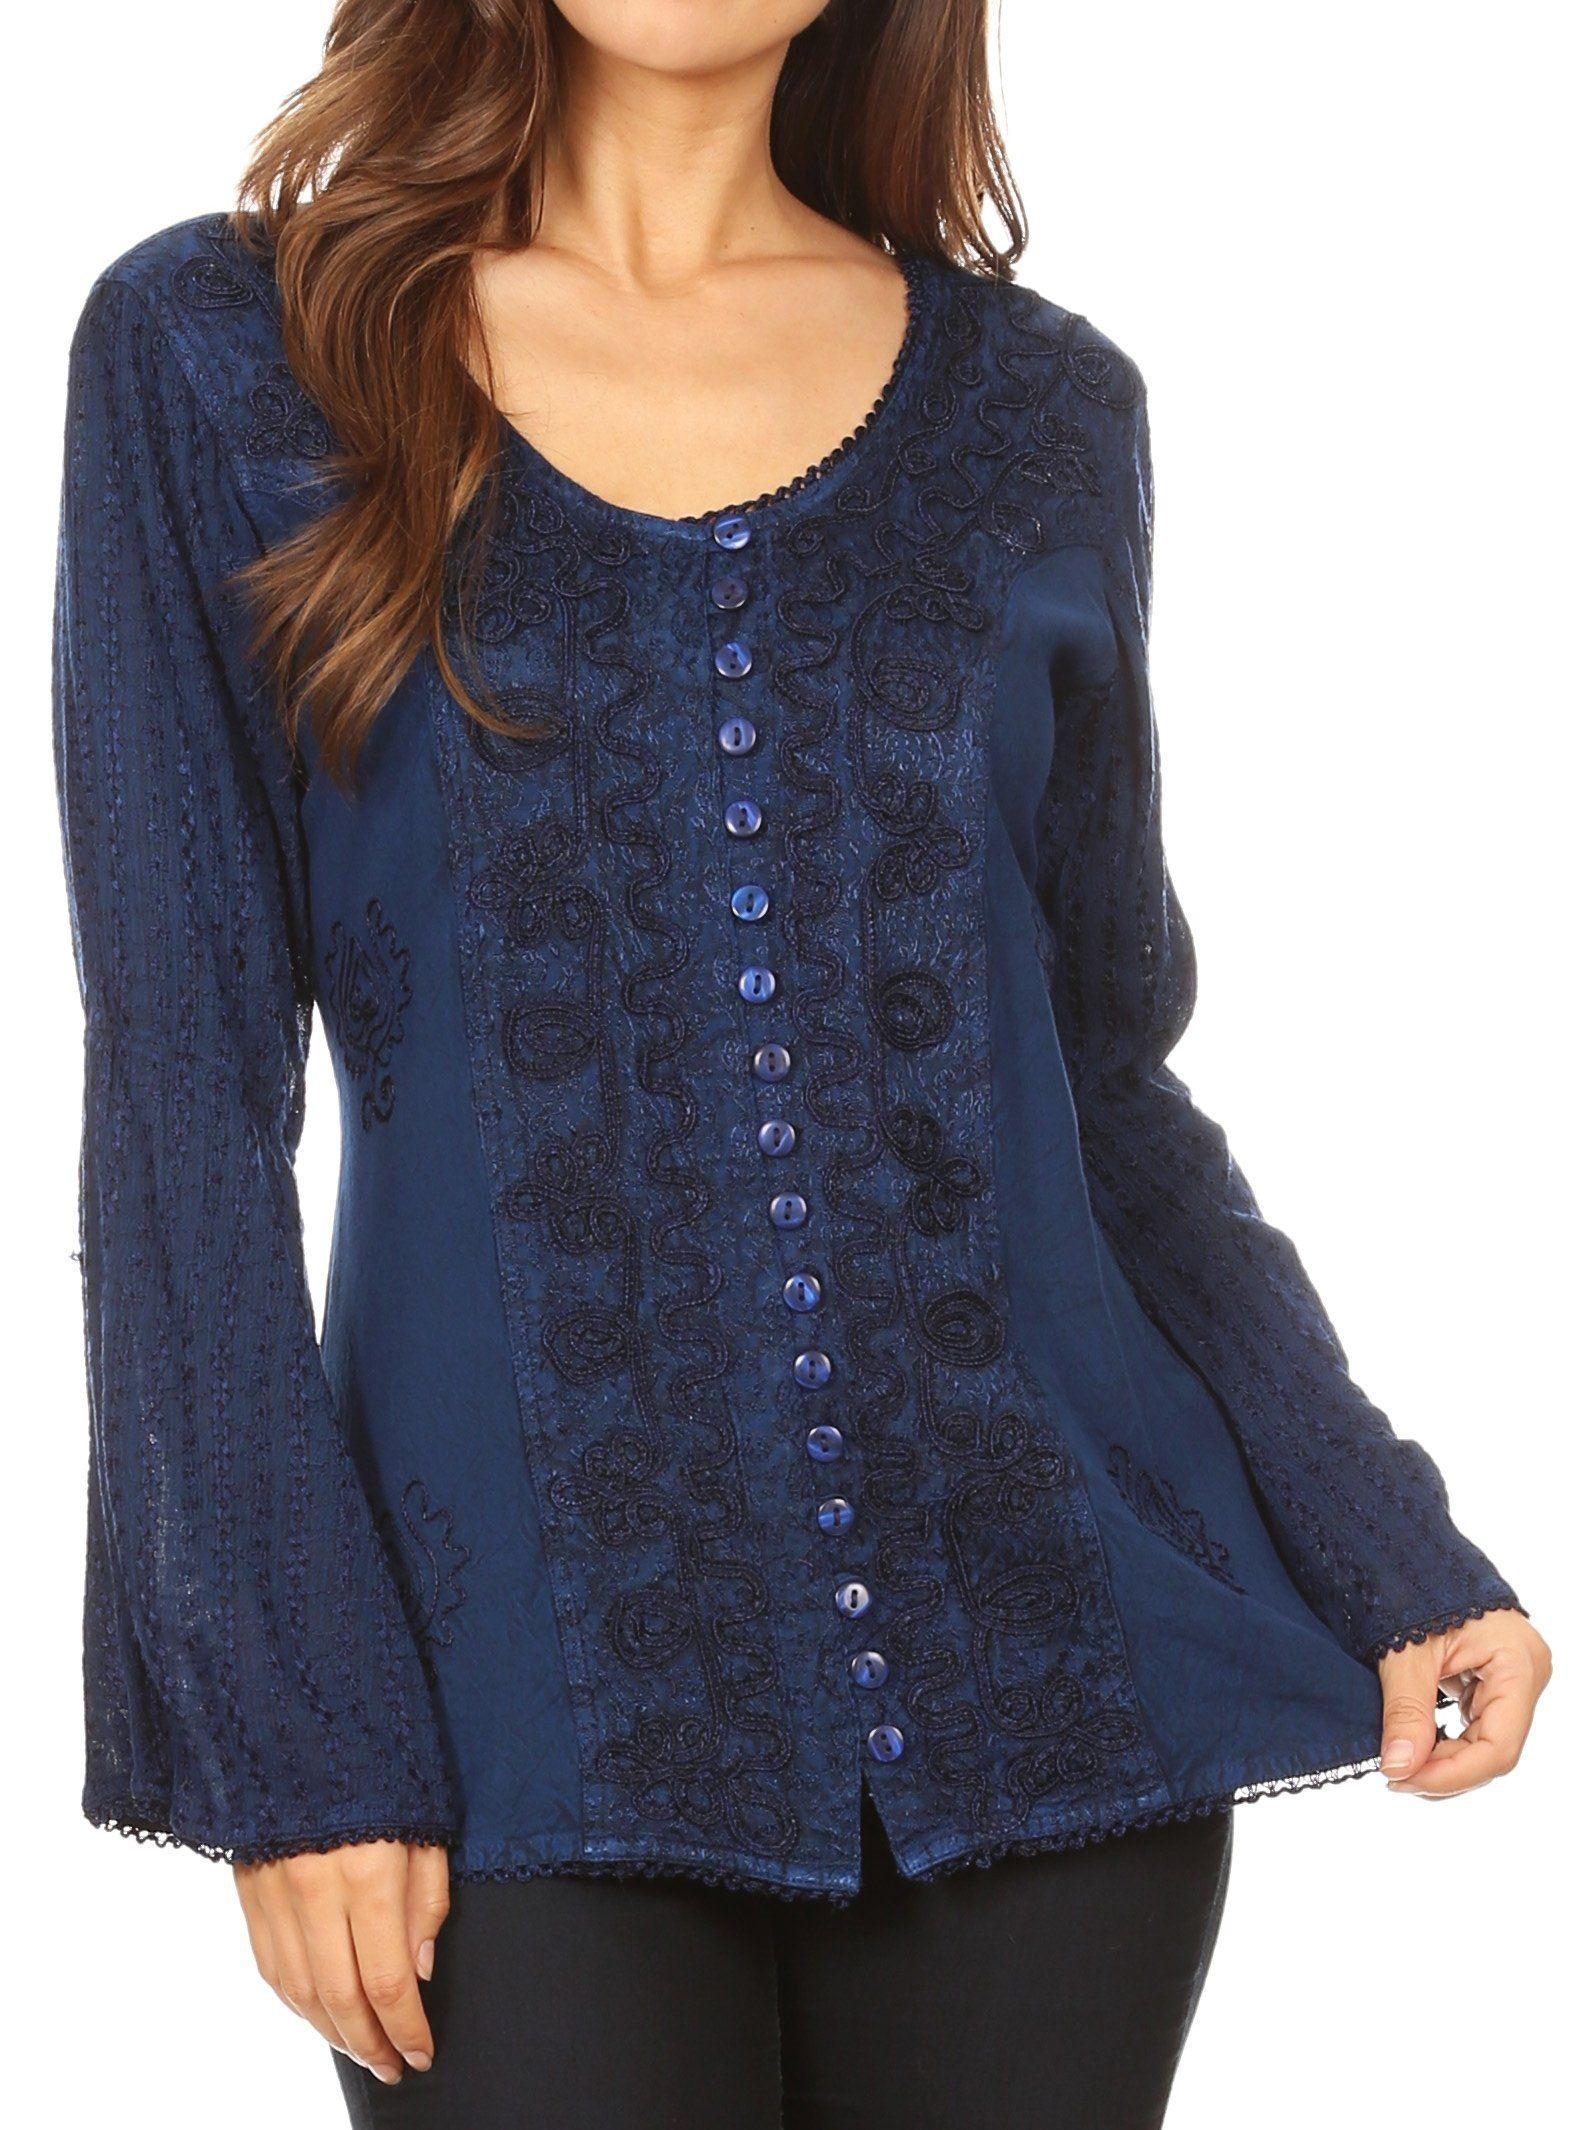 Sakkas Salma Womens Button Down Long Sleeve Blouse Top Shirt Stonewashed and Lace